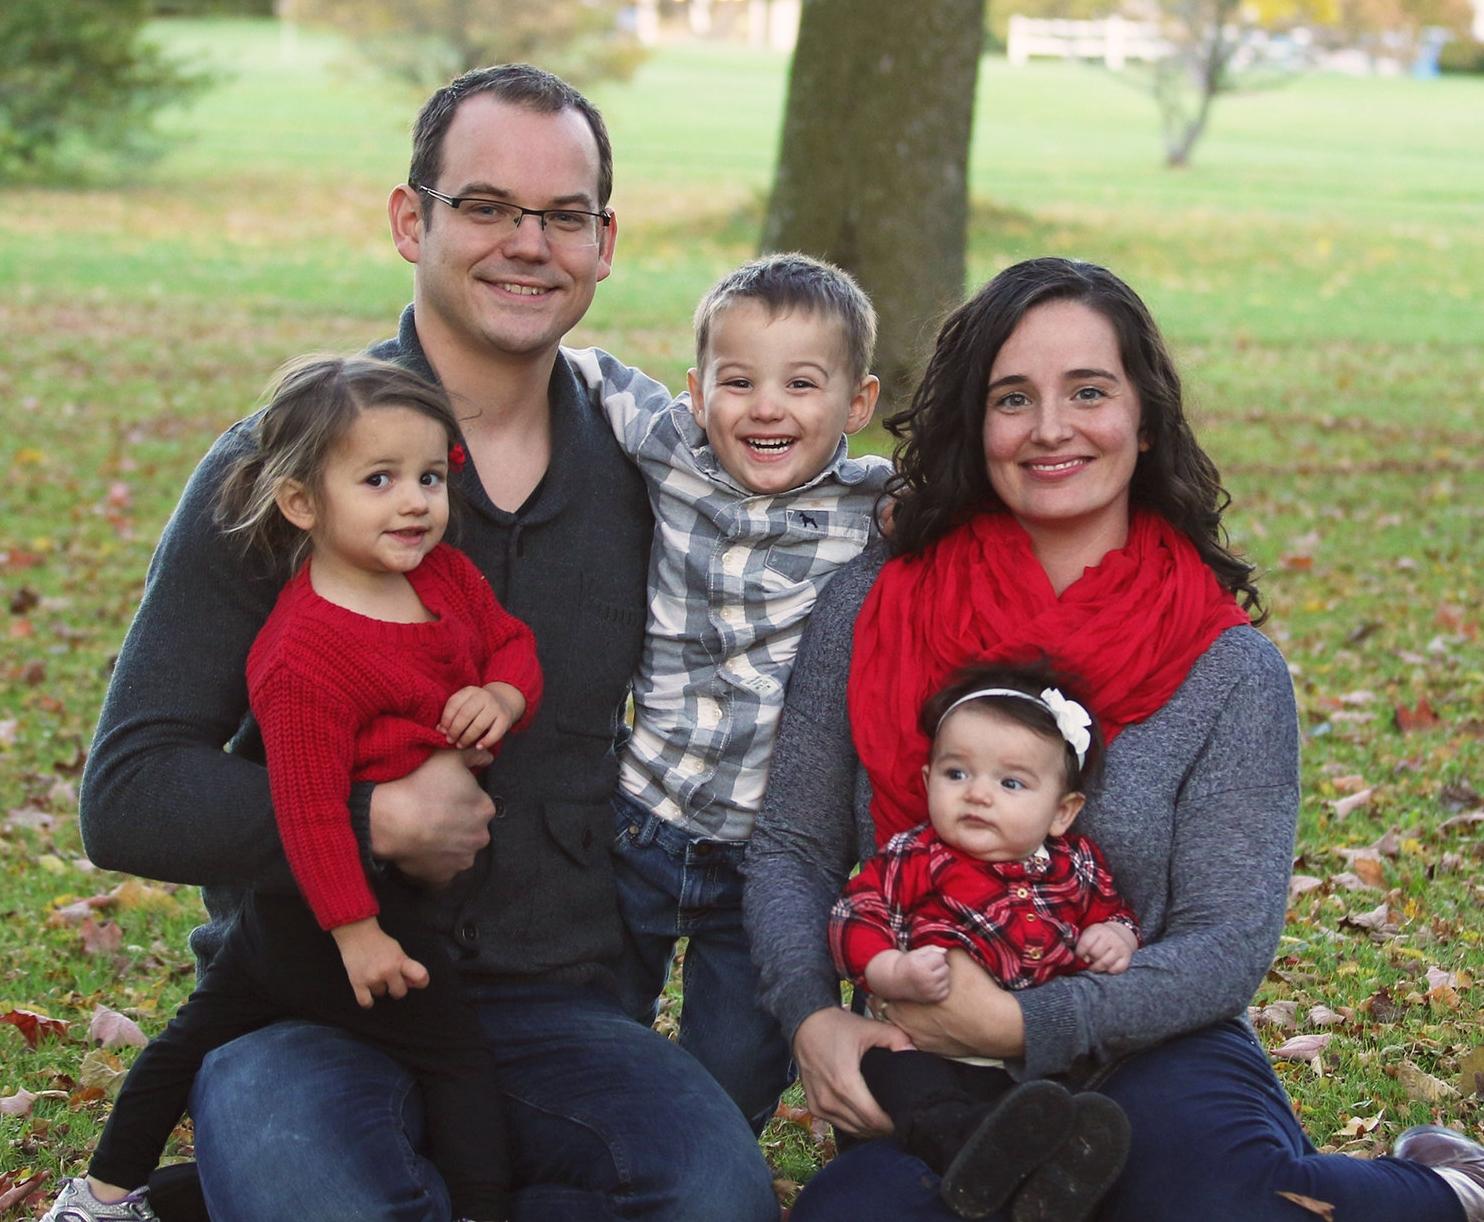 Eric & Brittany Pedersen  InterVarsity Christian Fellowship  Serving in Madison, WI